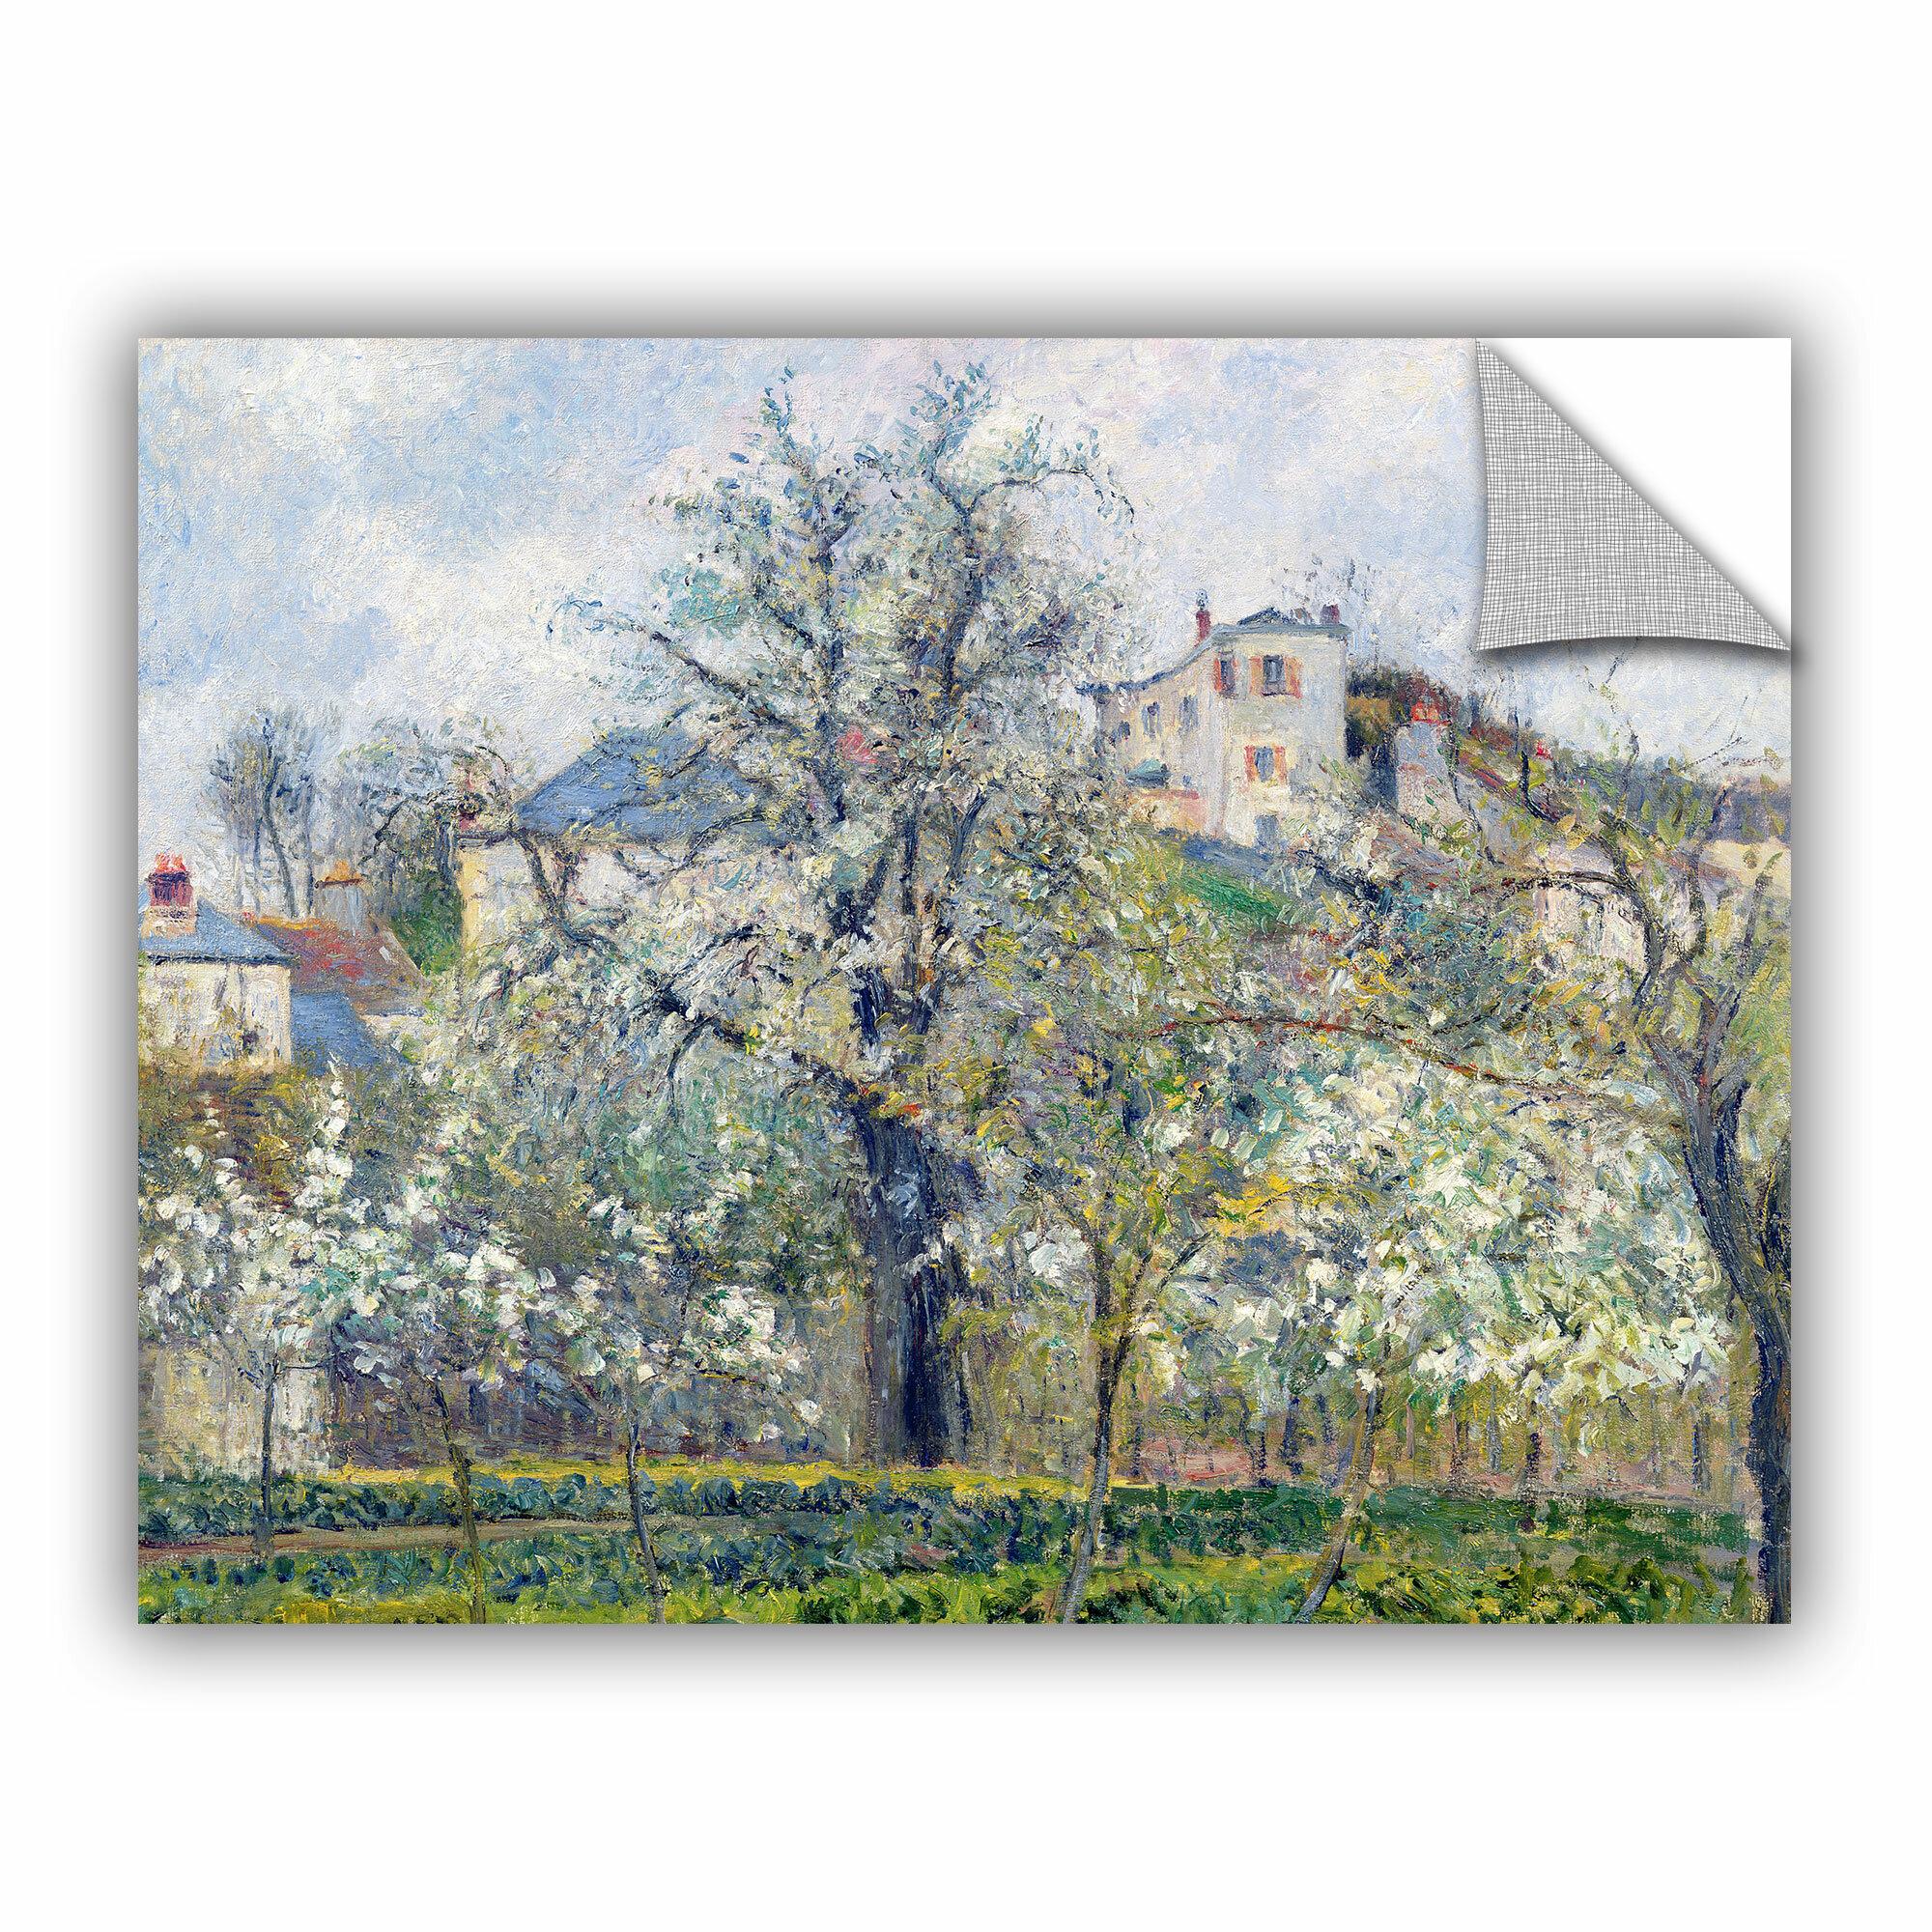 Artwall Bridgeman Camille Pissarro The Vegetable Garden With Trees In Blossom Spring Pontoise 1877 Wall Decal Wayfair